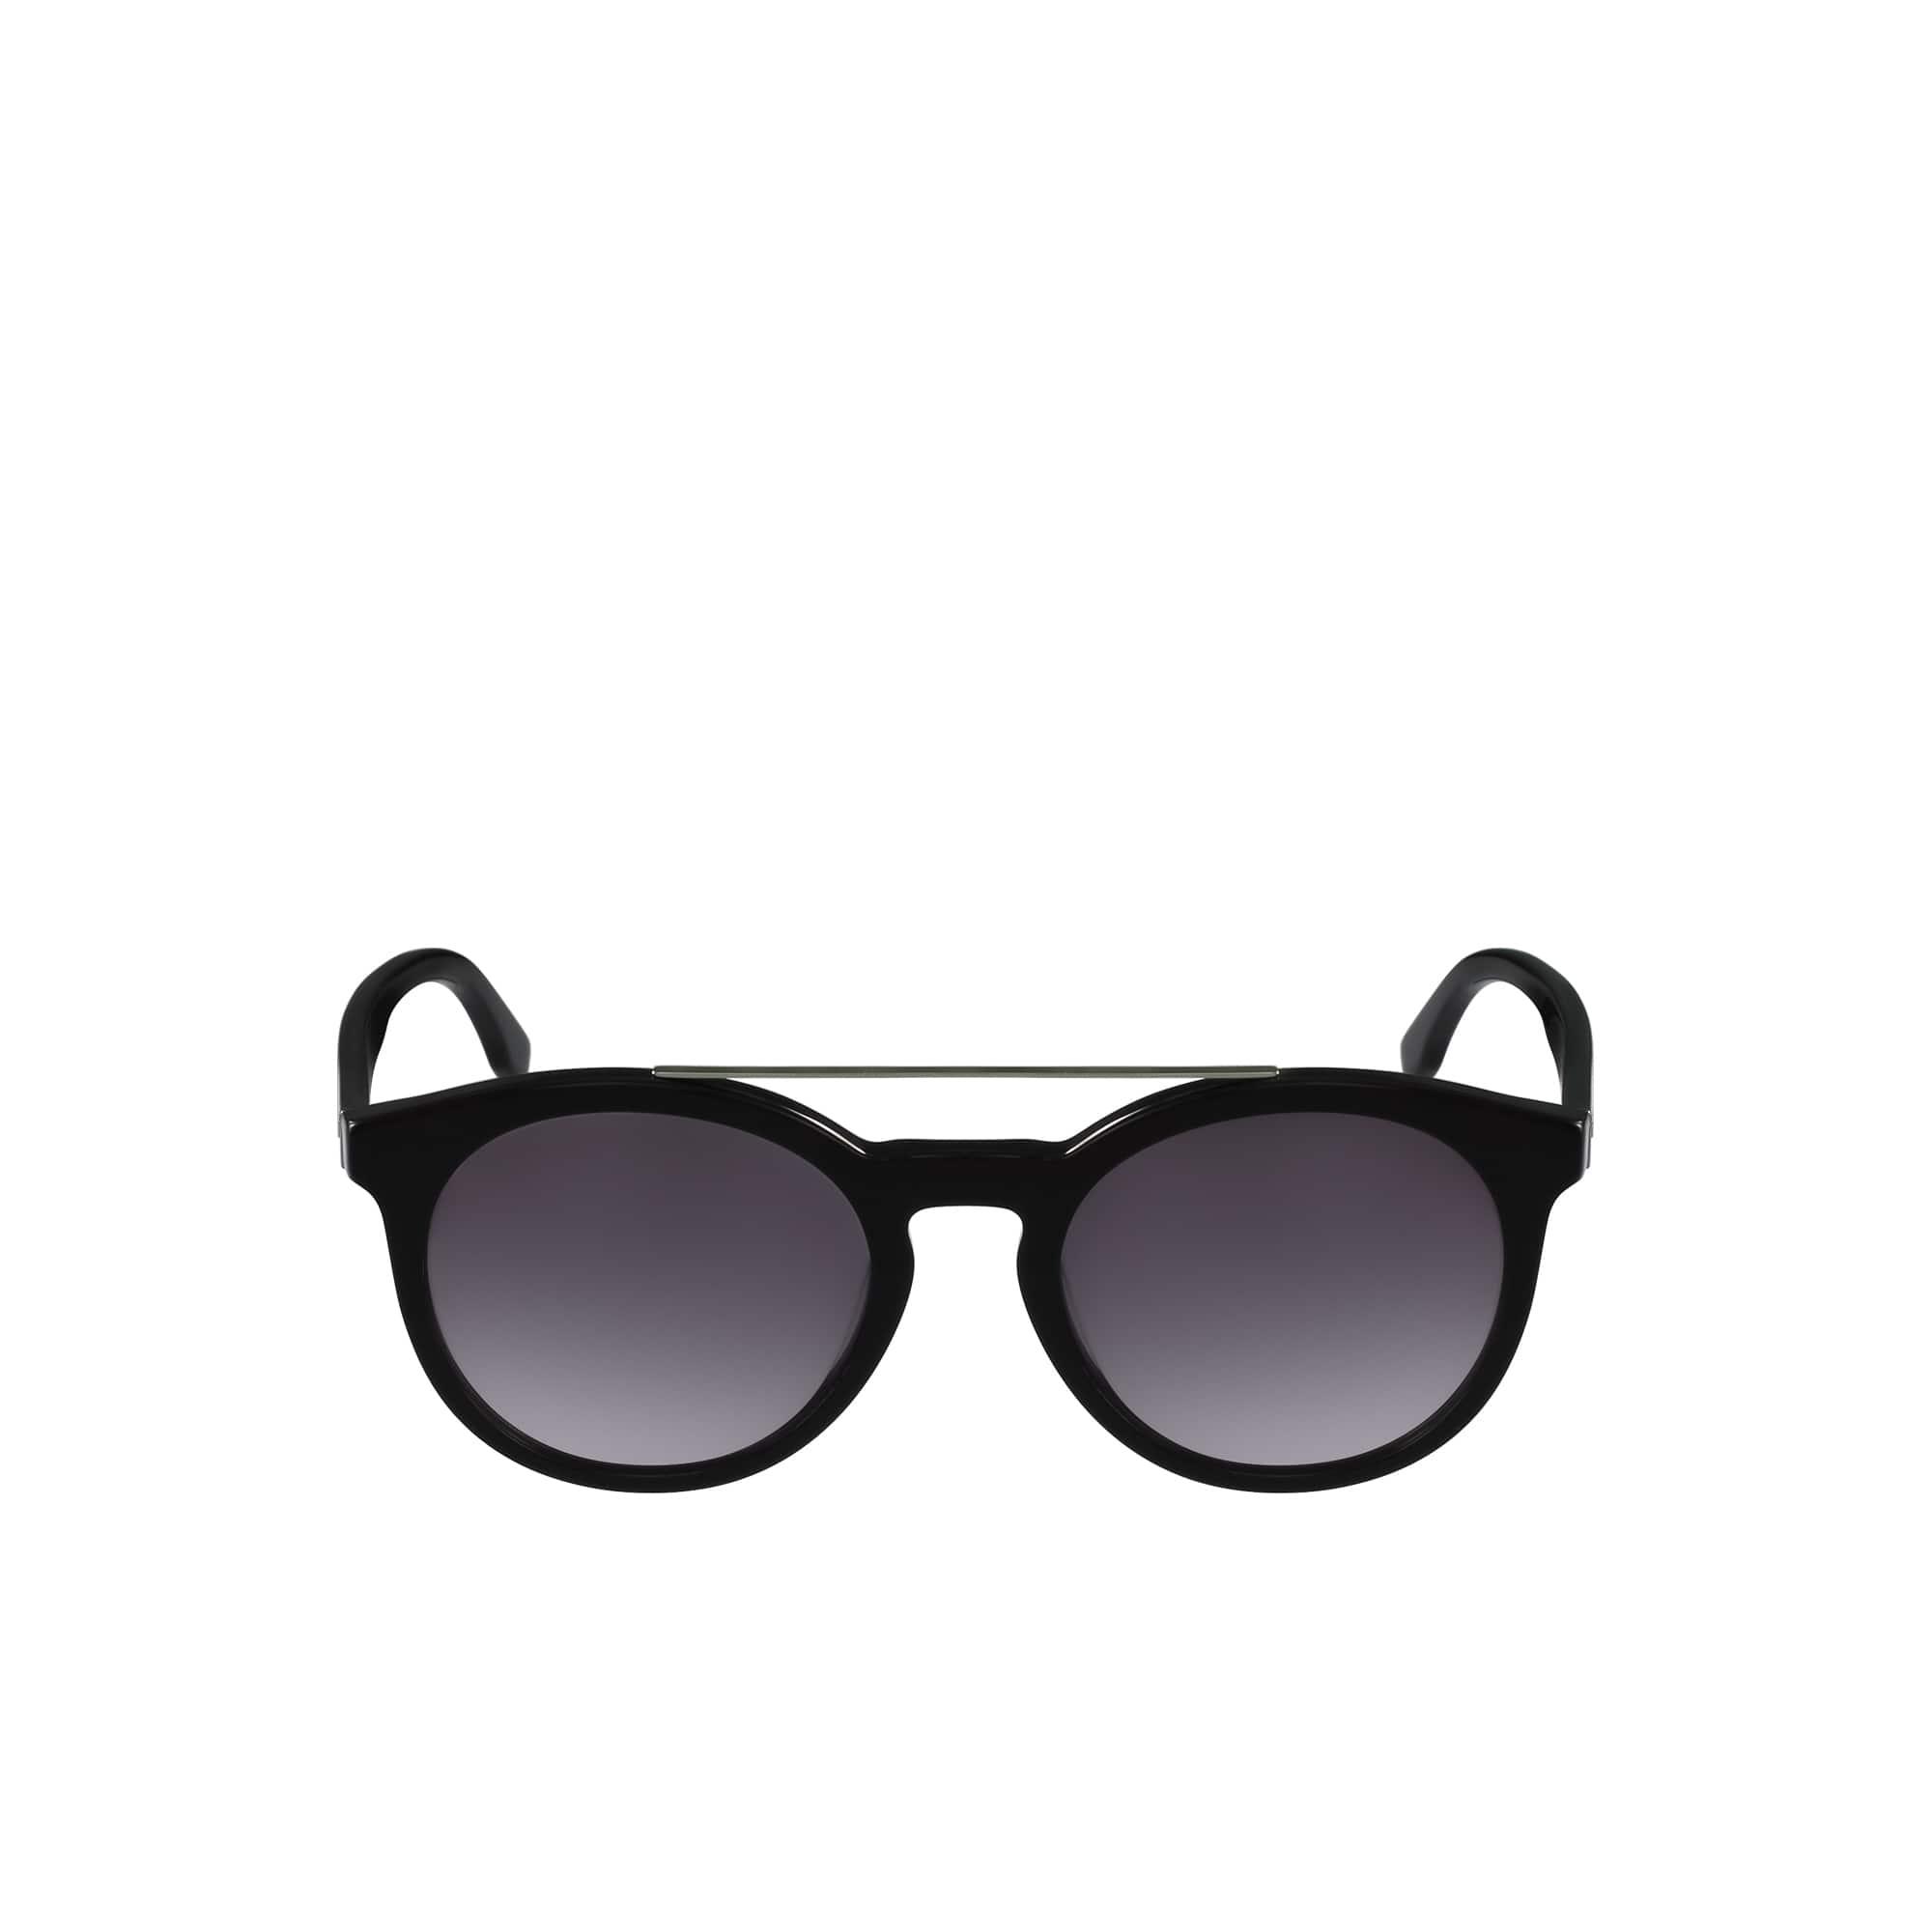 Plastic Color Block Sunglasses